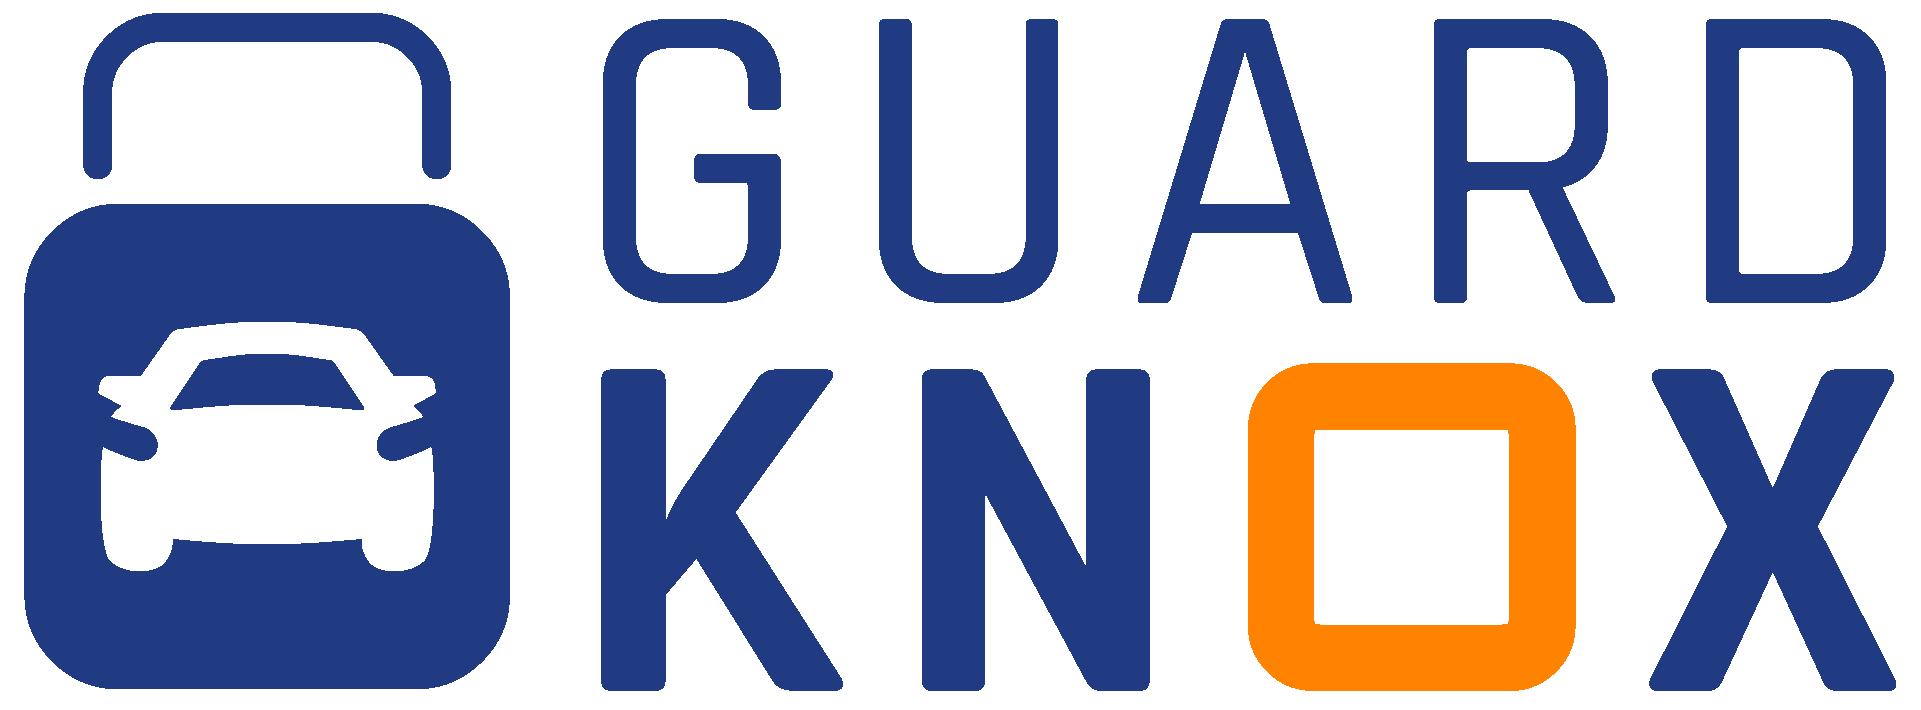 GuardKnox Logo Color